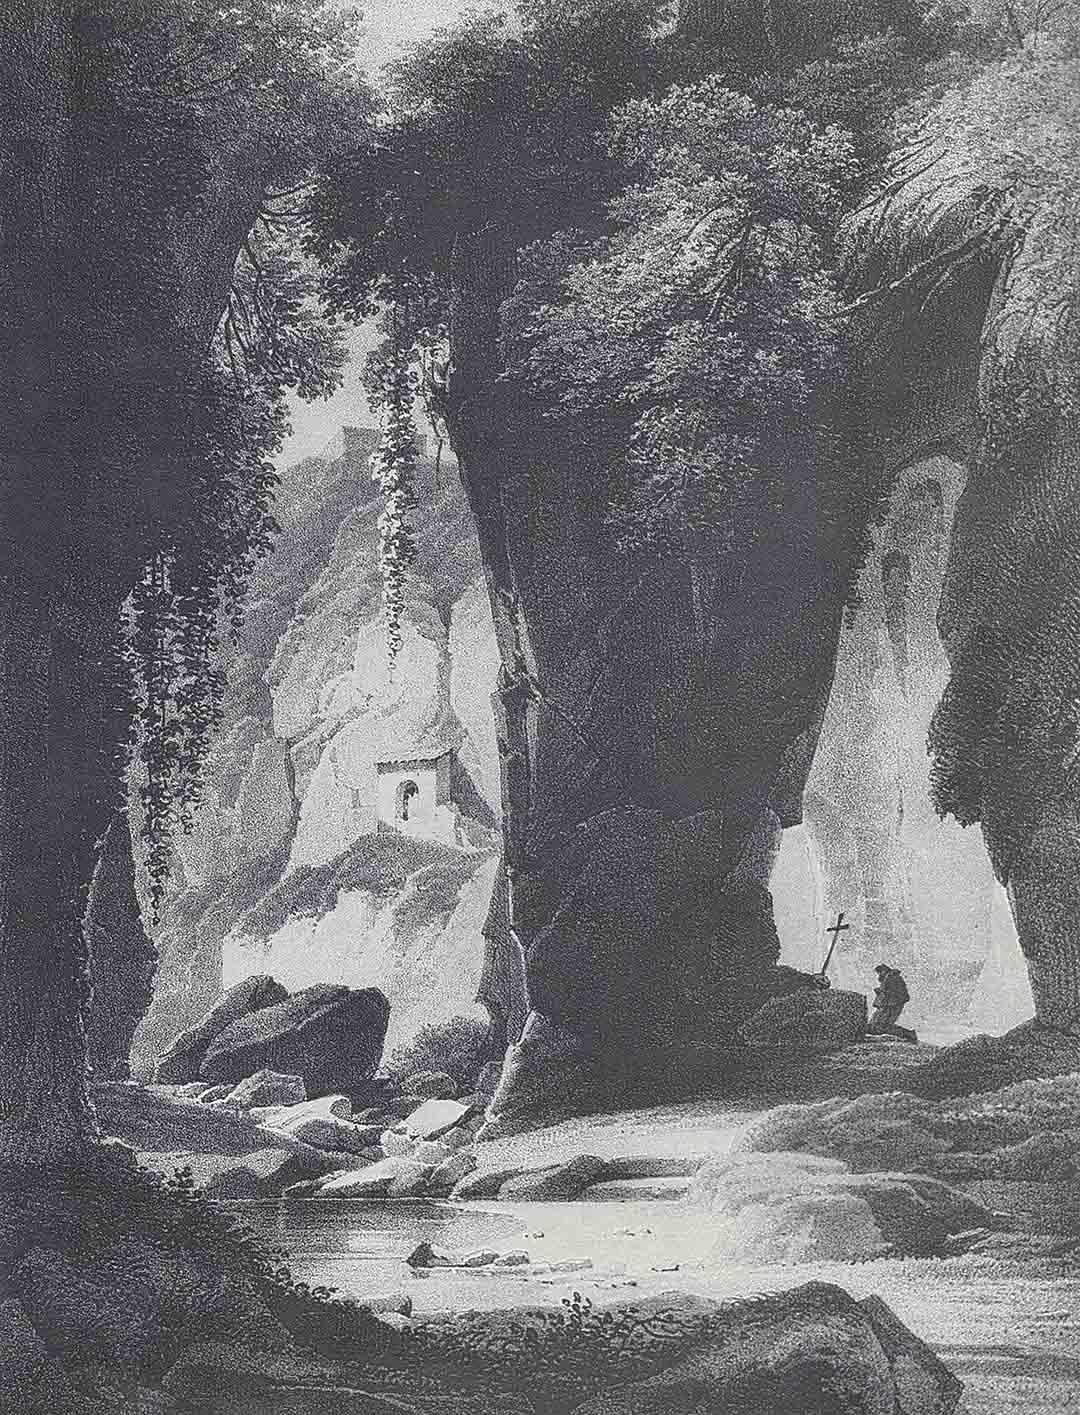 Achille-Etna MICHALLON (Parigi 1796 – Parigi 1822) – Alexandre-François CAMINADE (Parigi 1789 – Versailles 1862), Grottes de Sorrento, 1820 circa